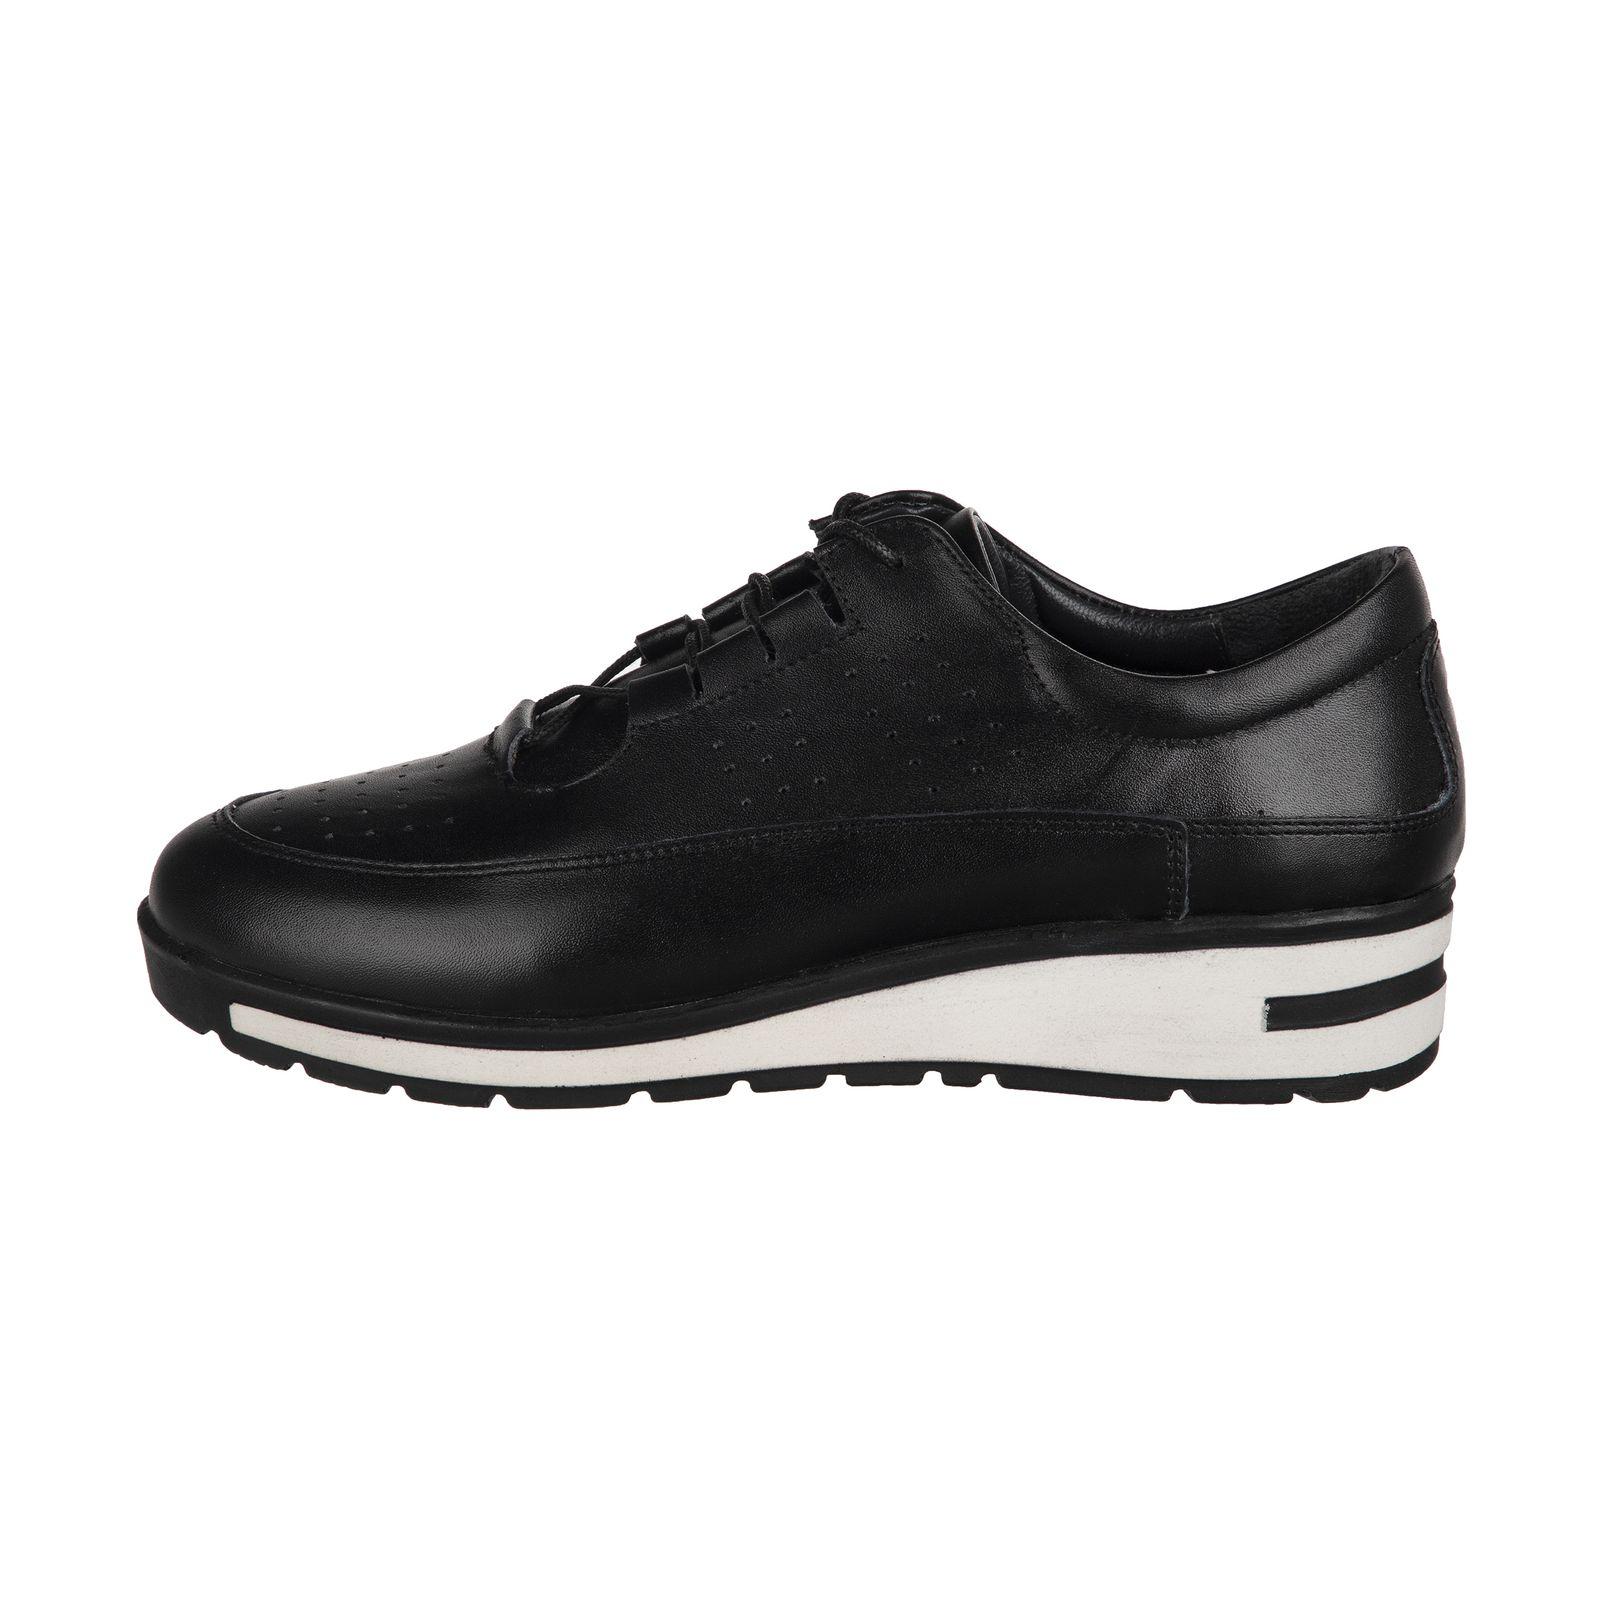 کفش روزمره زنانه سوته مدل 3068A500101 -  - 2